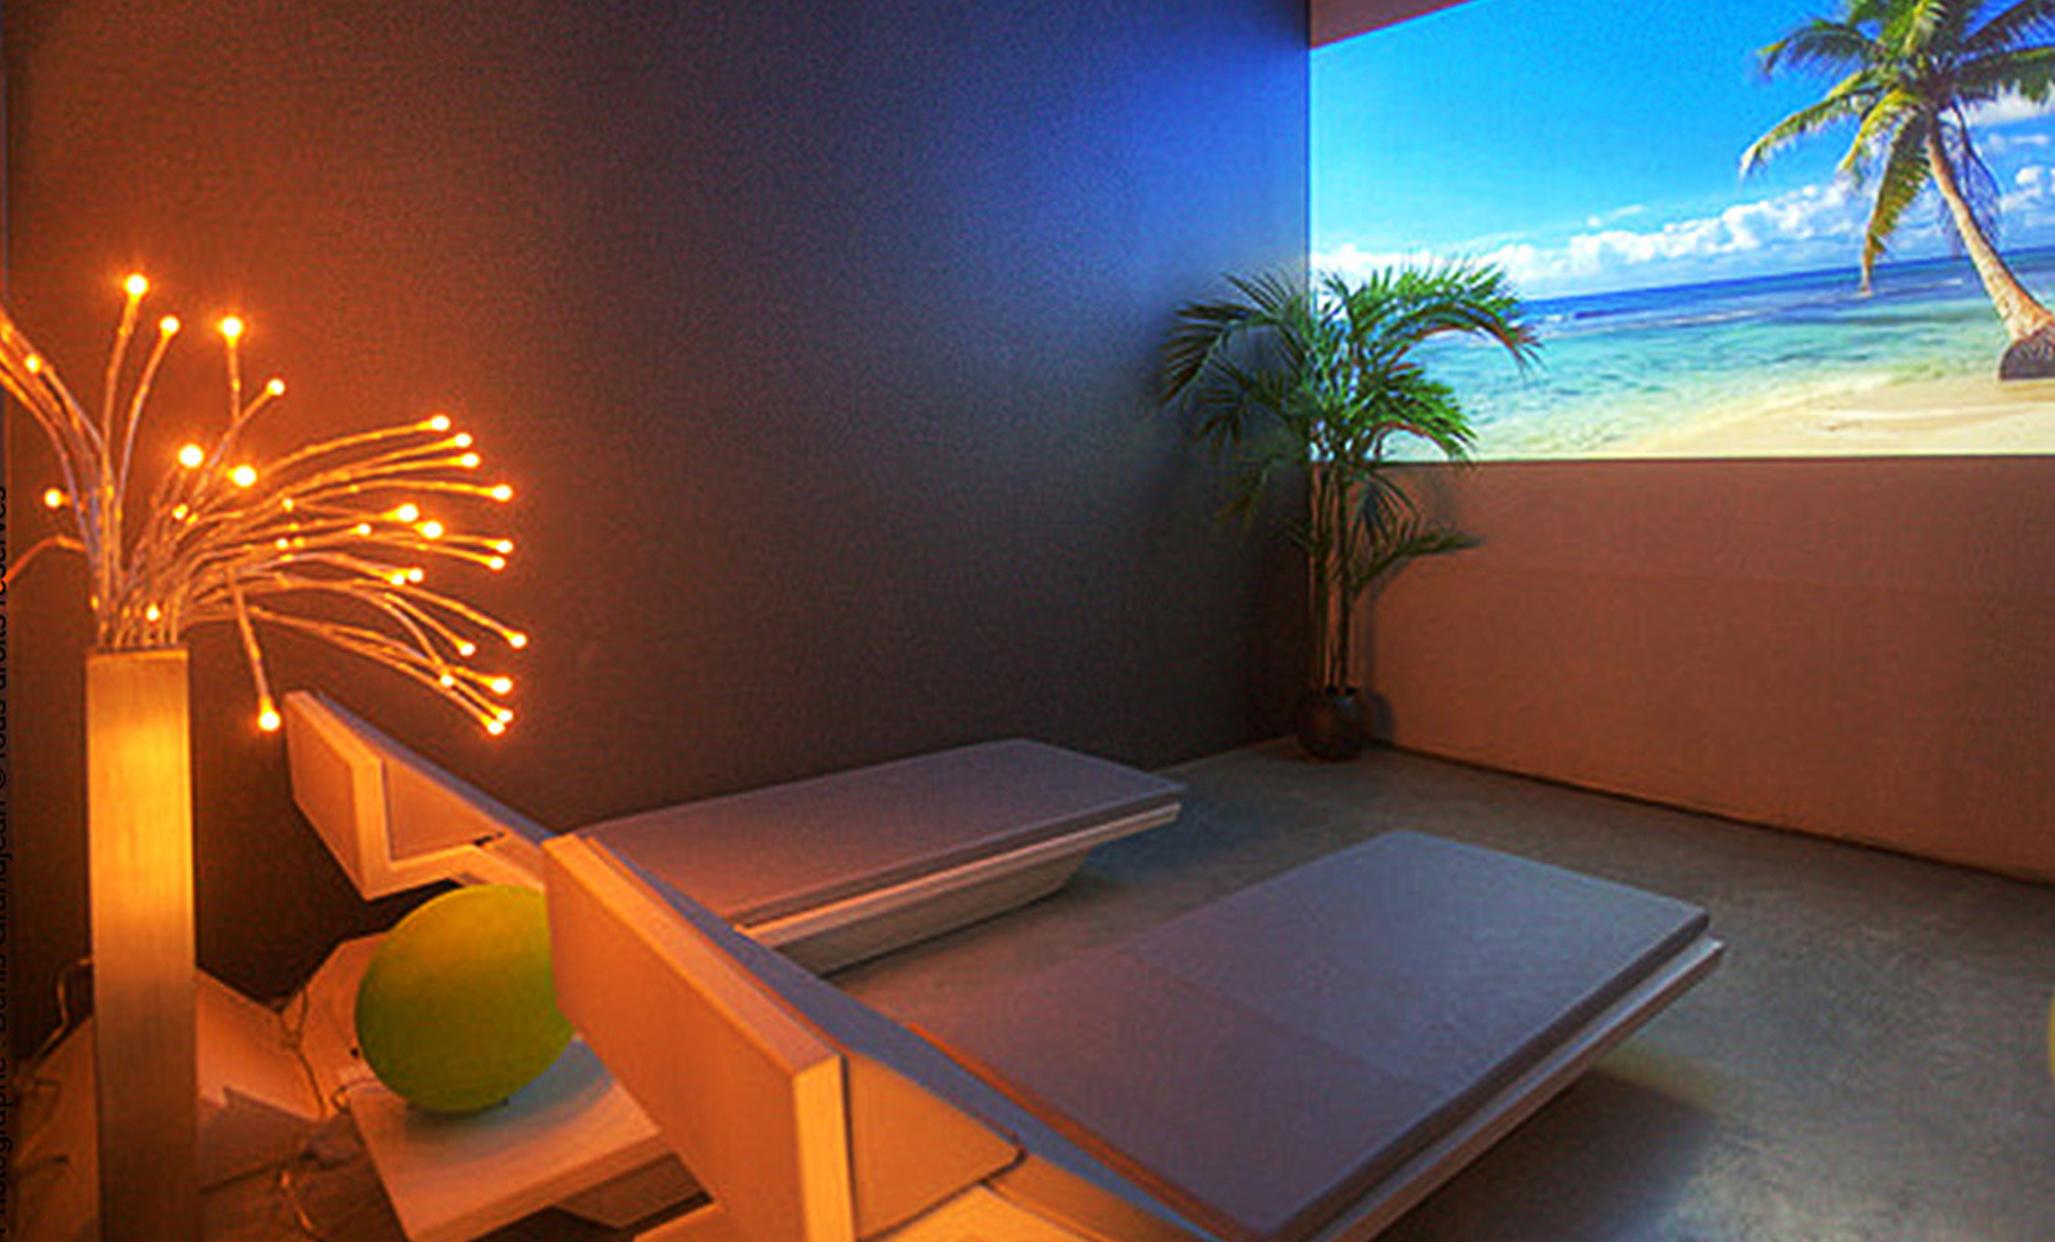 Espace privatif biola sauna hamman spa sentosa for Espace de relaxation